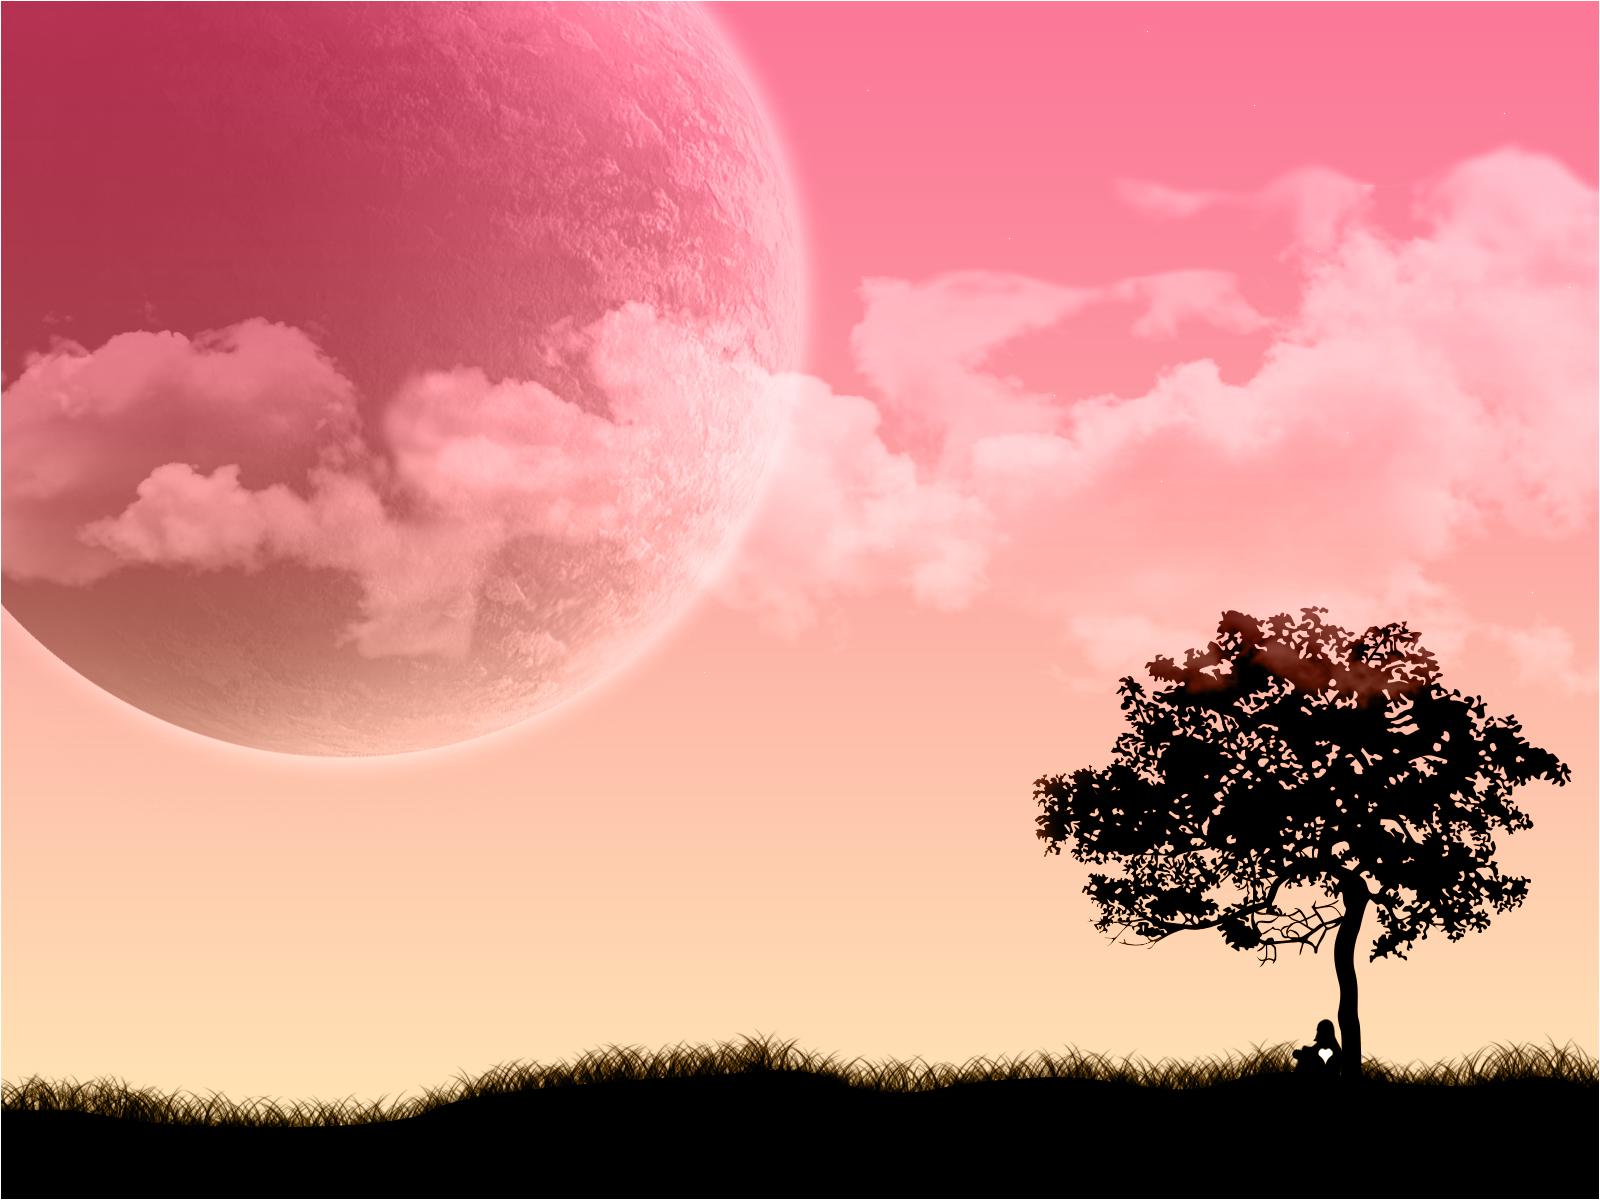 hp wallpaper pink - photo #18